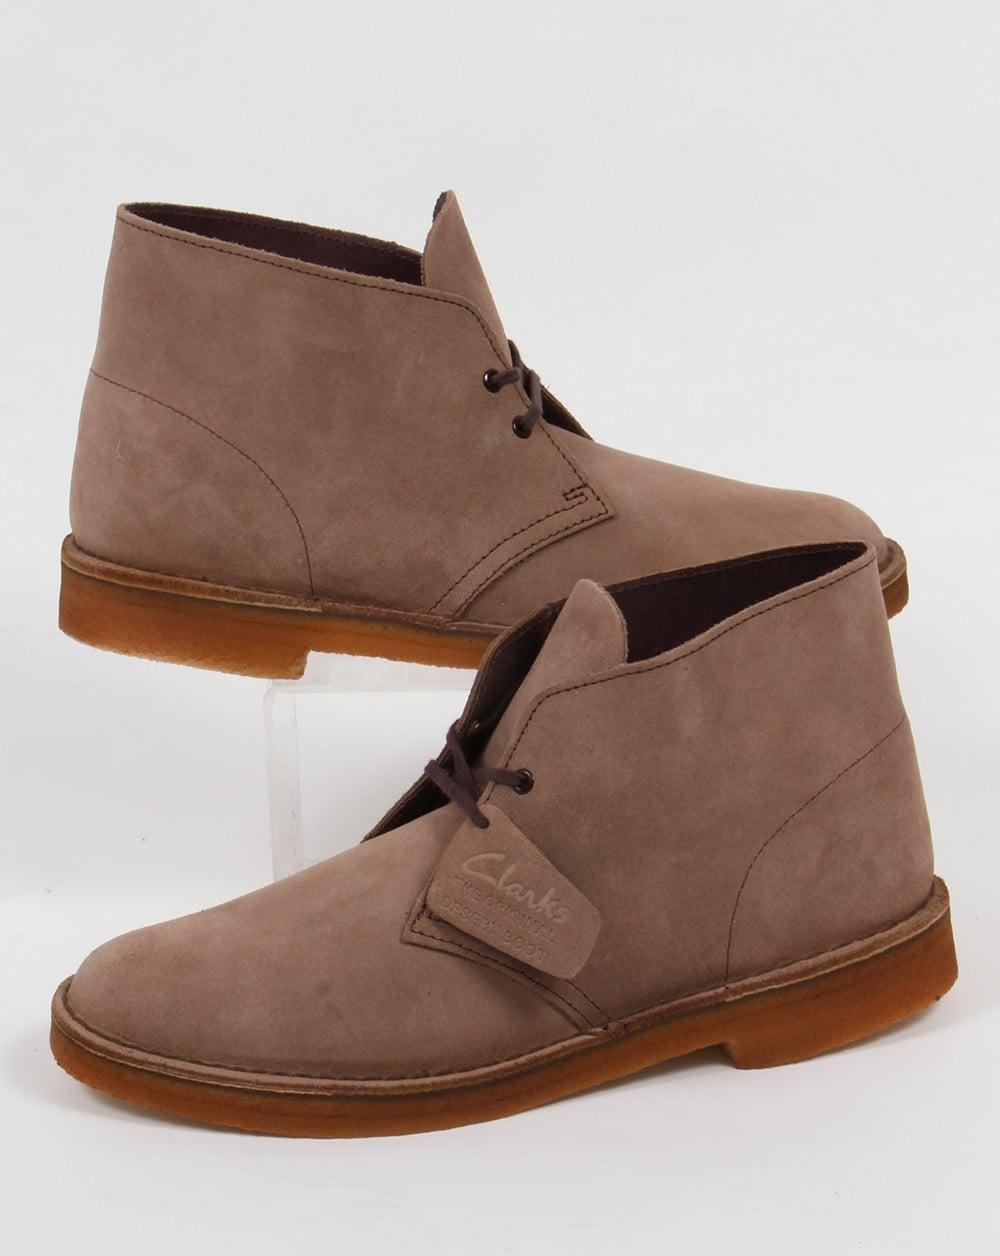 clarks originals desert boot in suede wolf grey shoes mens. Black Bedroom Furniture Sets. Home Design Ideas